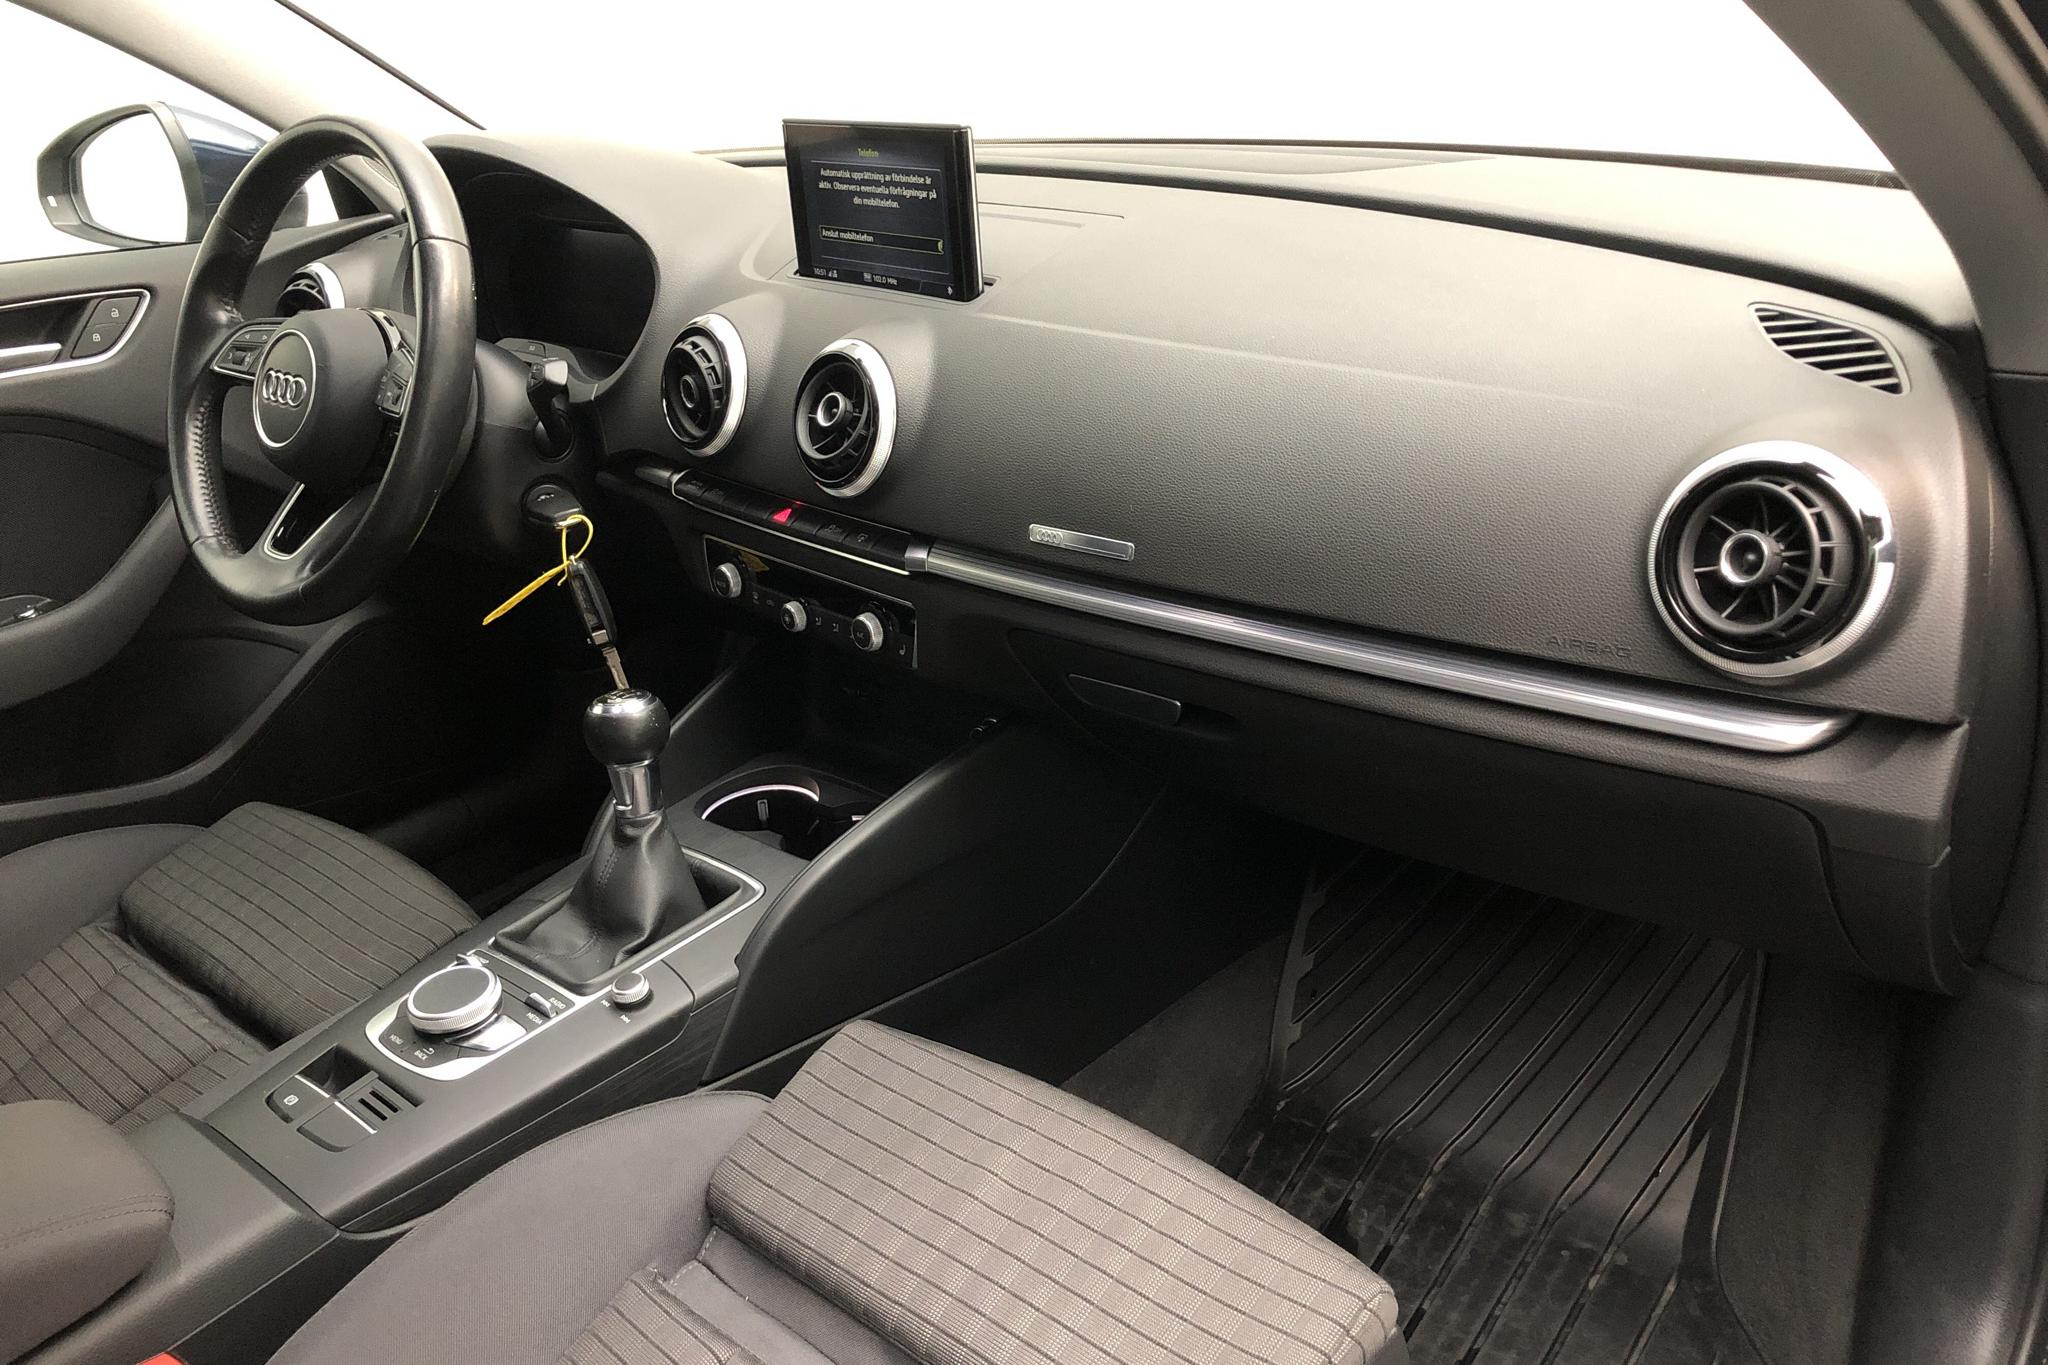 Audi A3 1.4 TFSI Sedan (150hk) - 53 500 km - Manual - blue - 2017